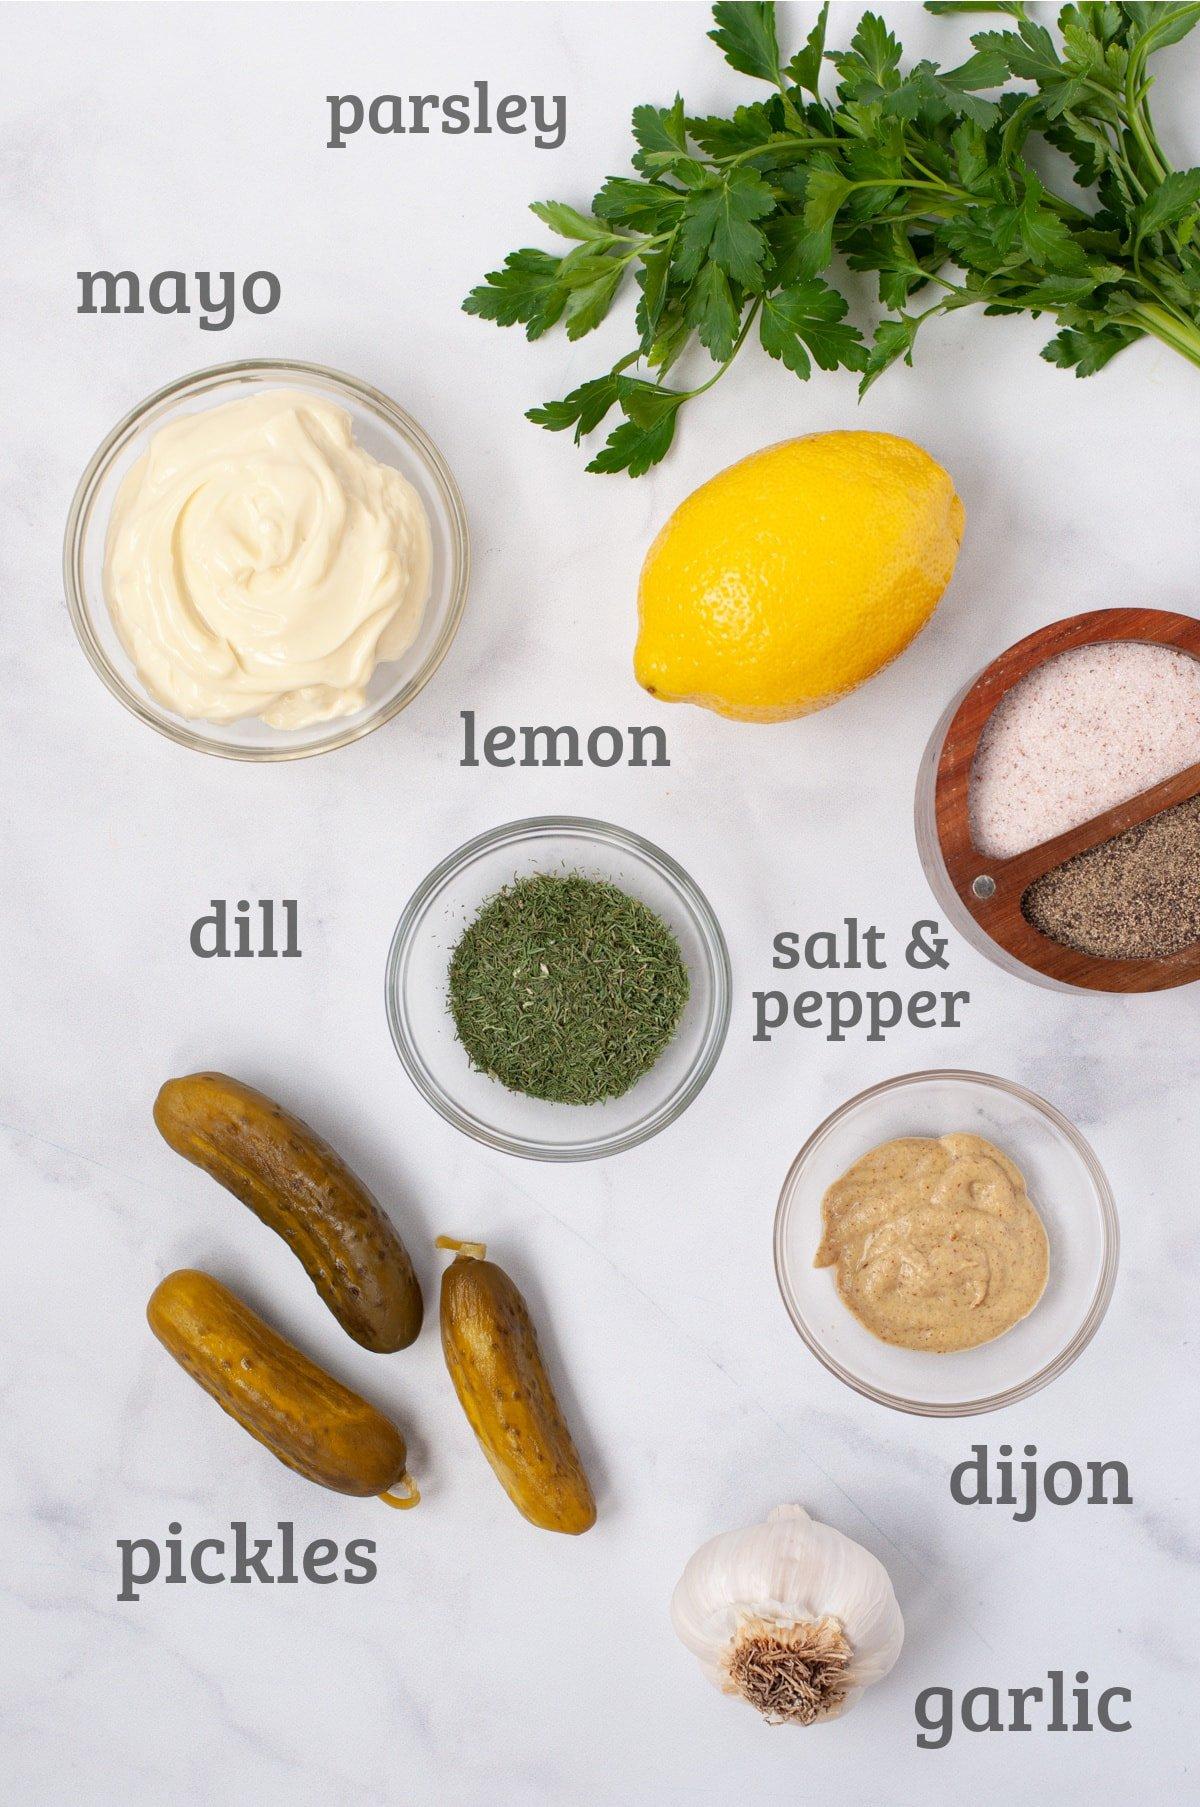 Ingredients for tartar sauce - parsley, lemon, mayo, dill, dijon, pickles, garlic, salt and pepper